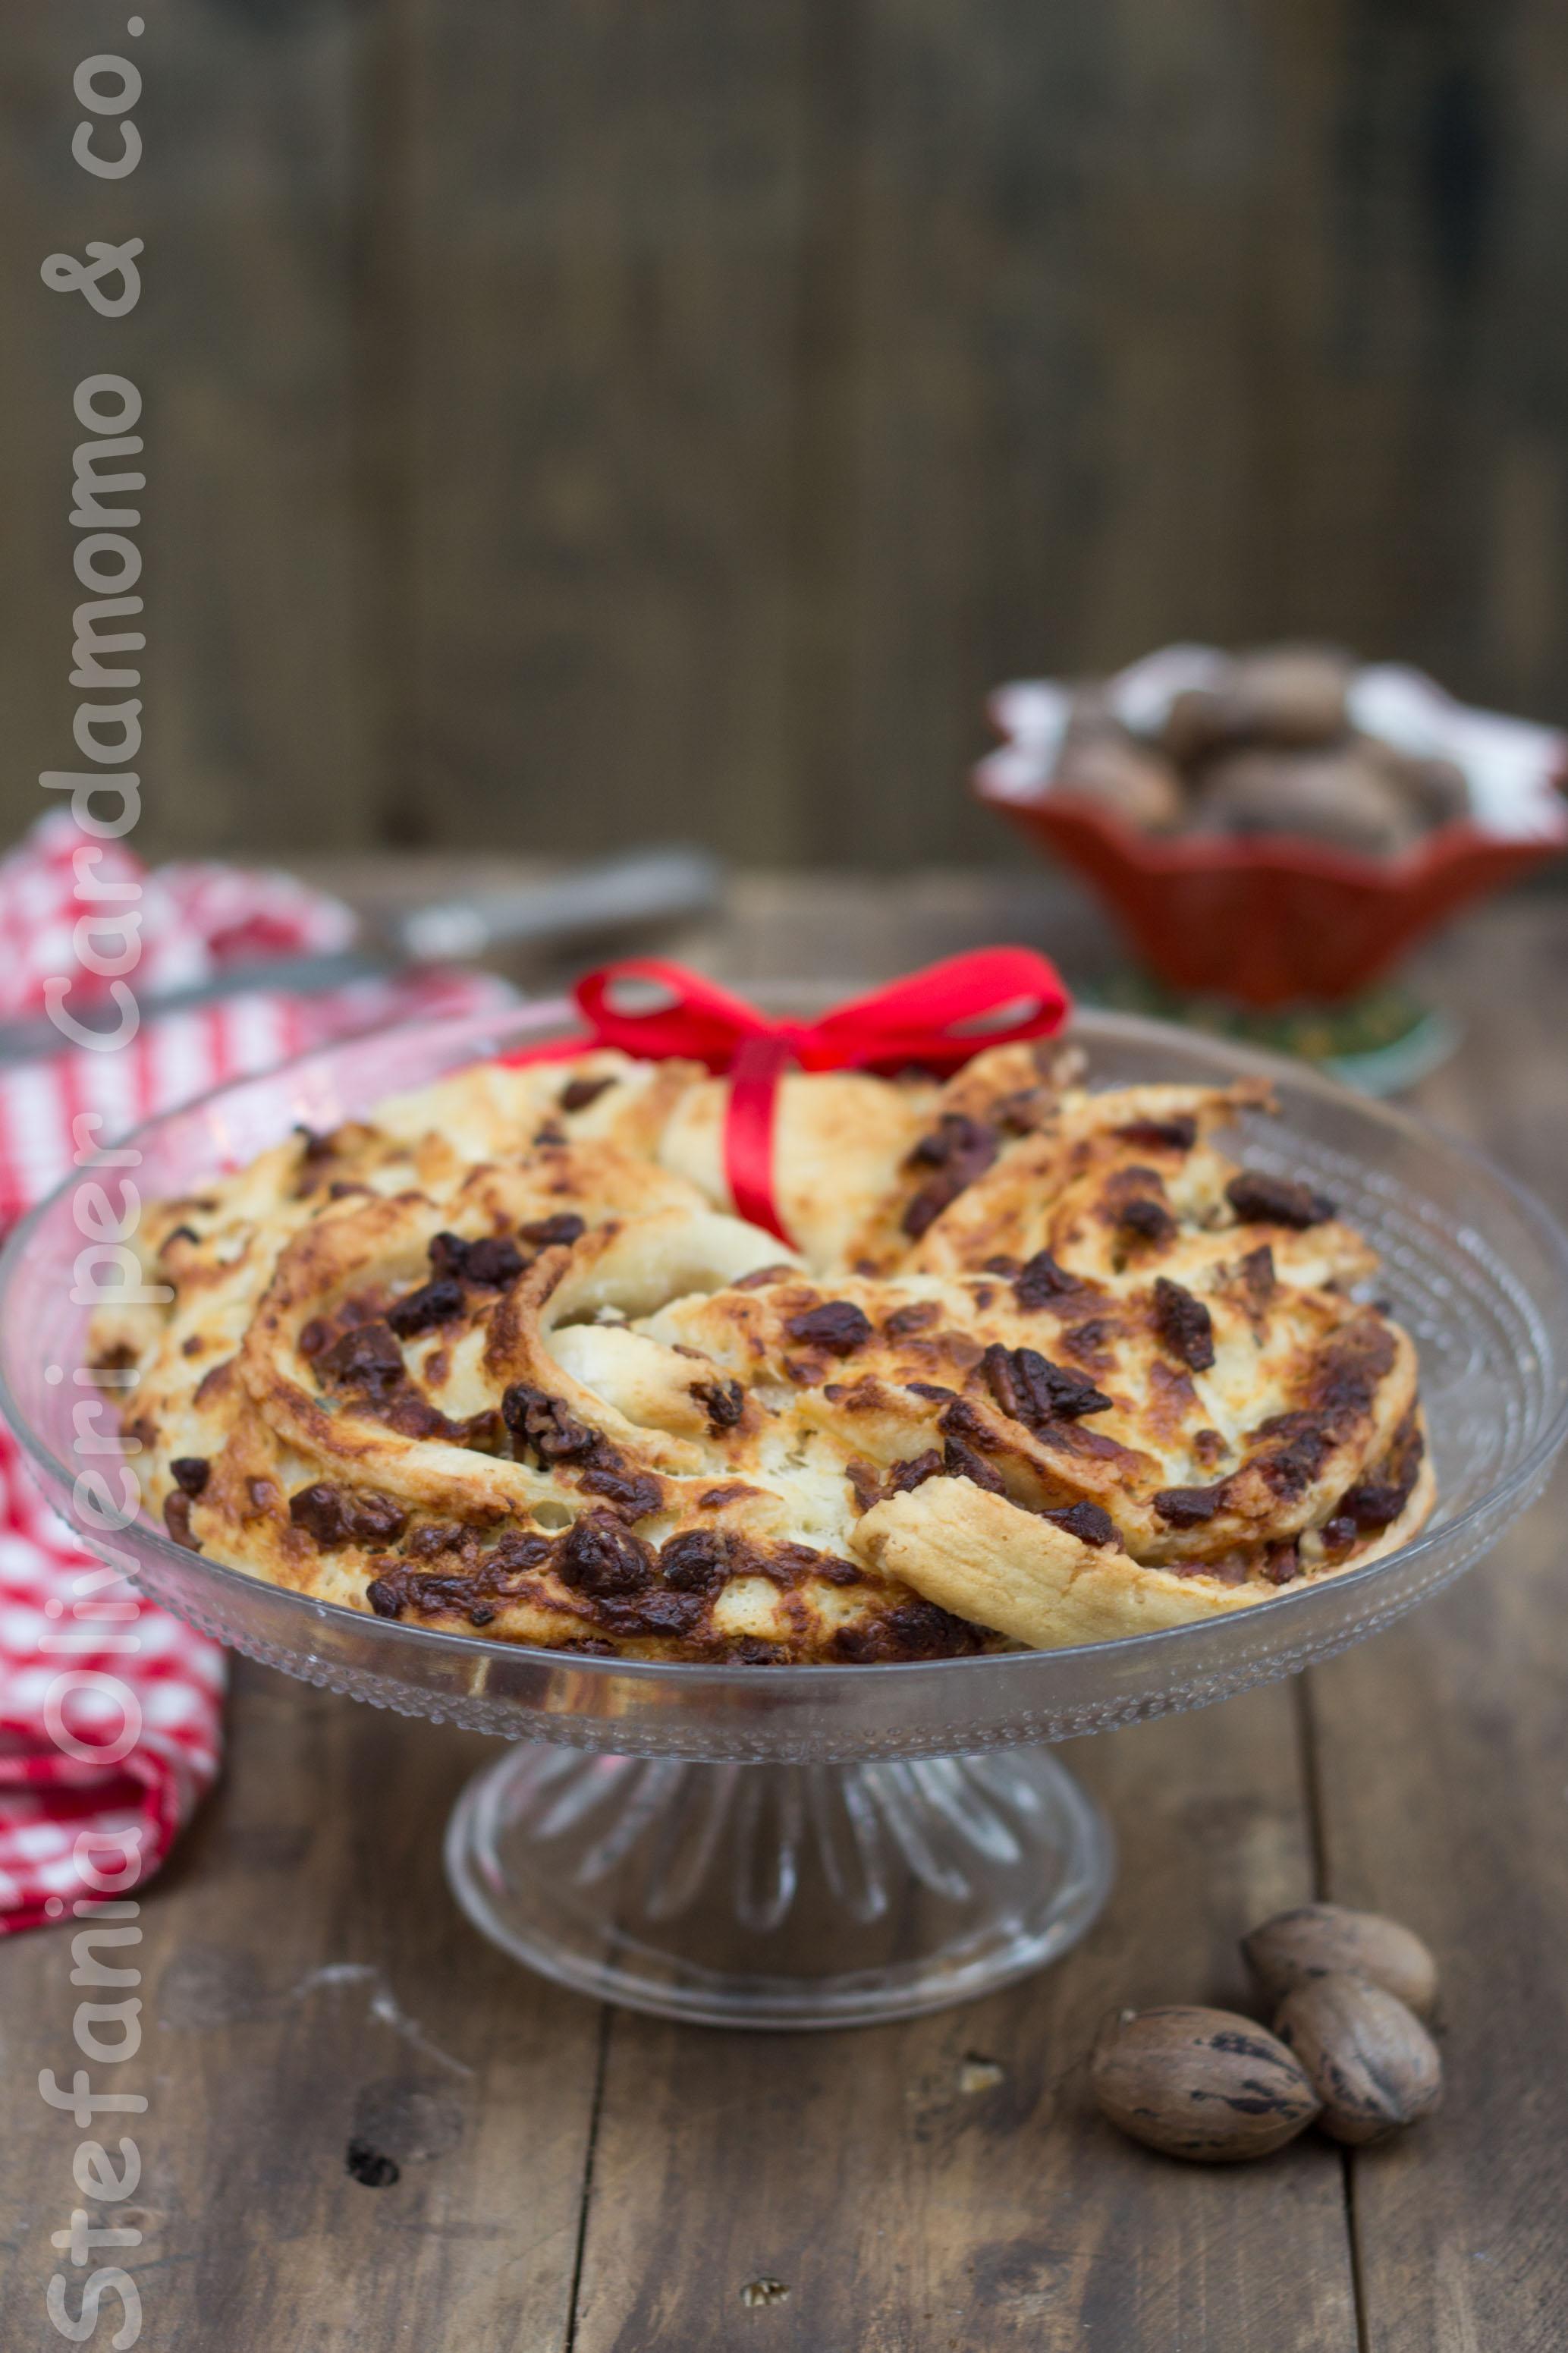 Angelica salata senza glutine - Cardamomo & co